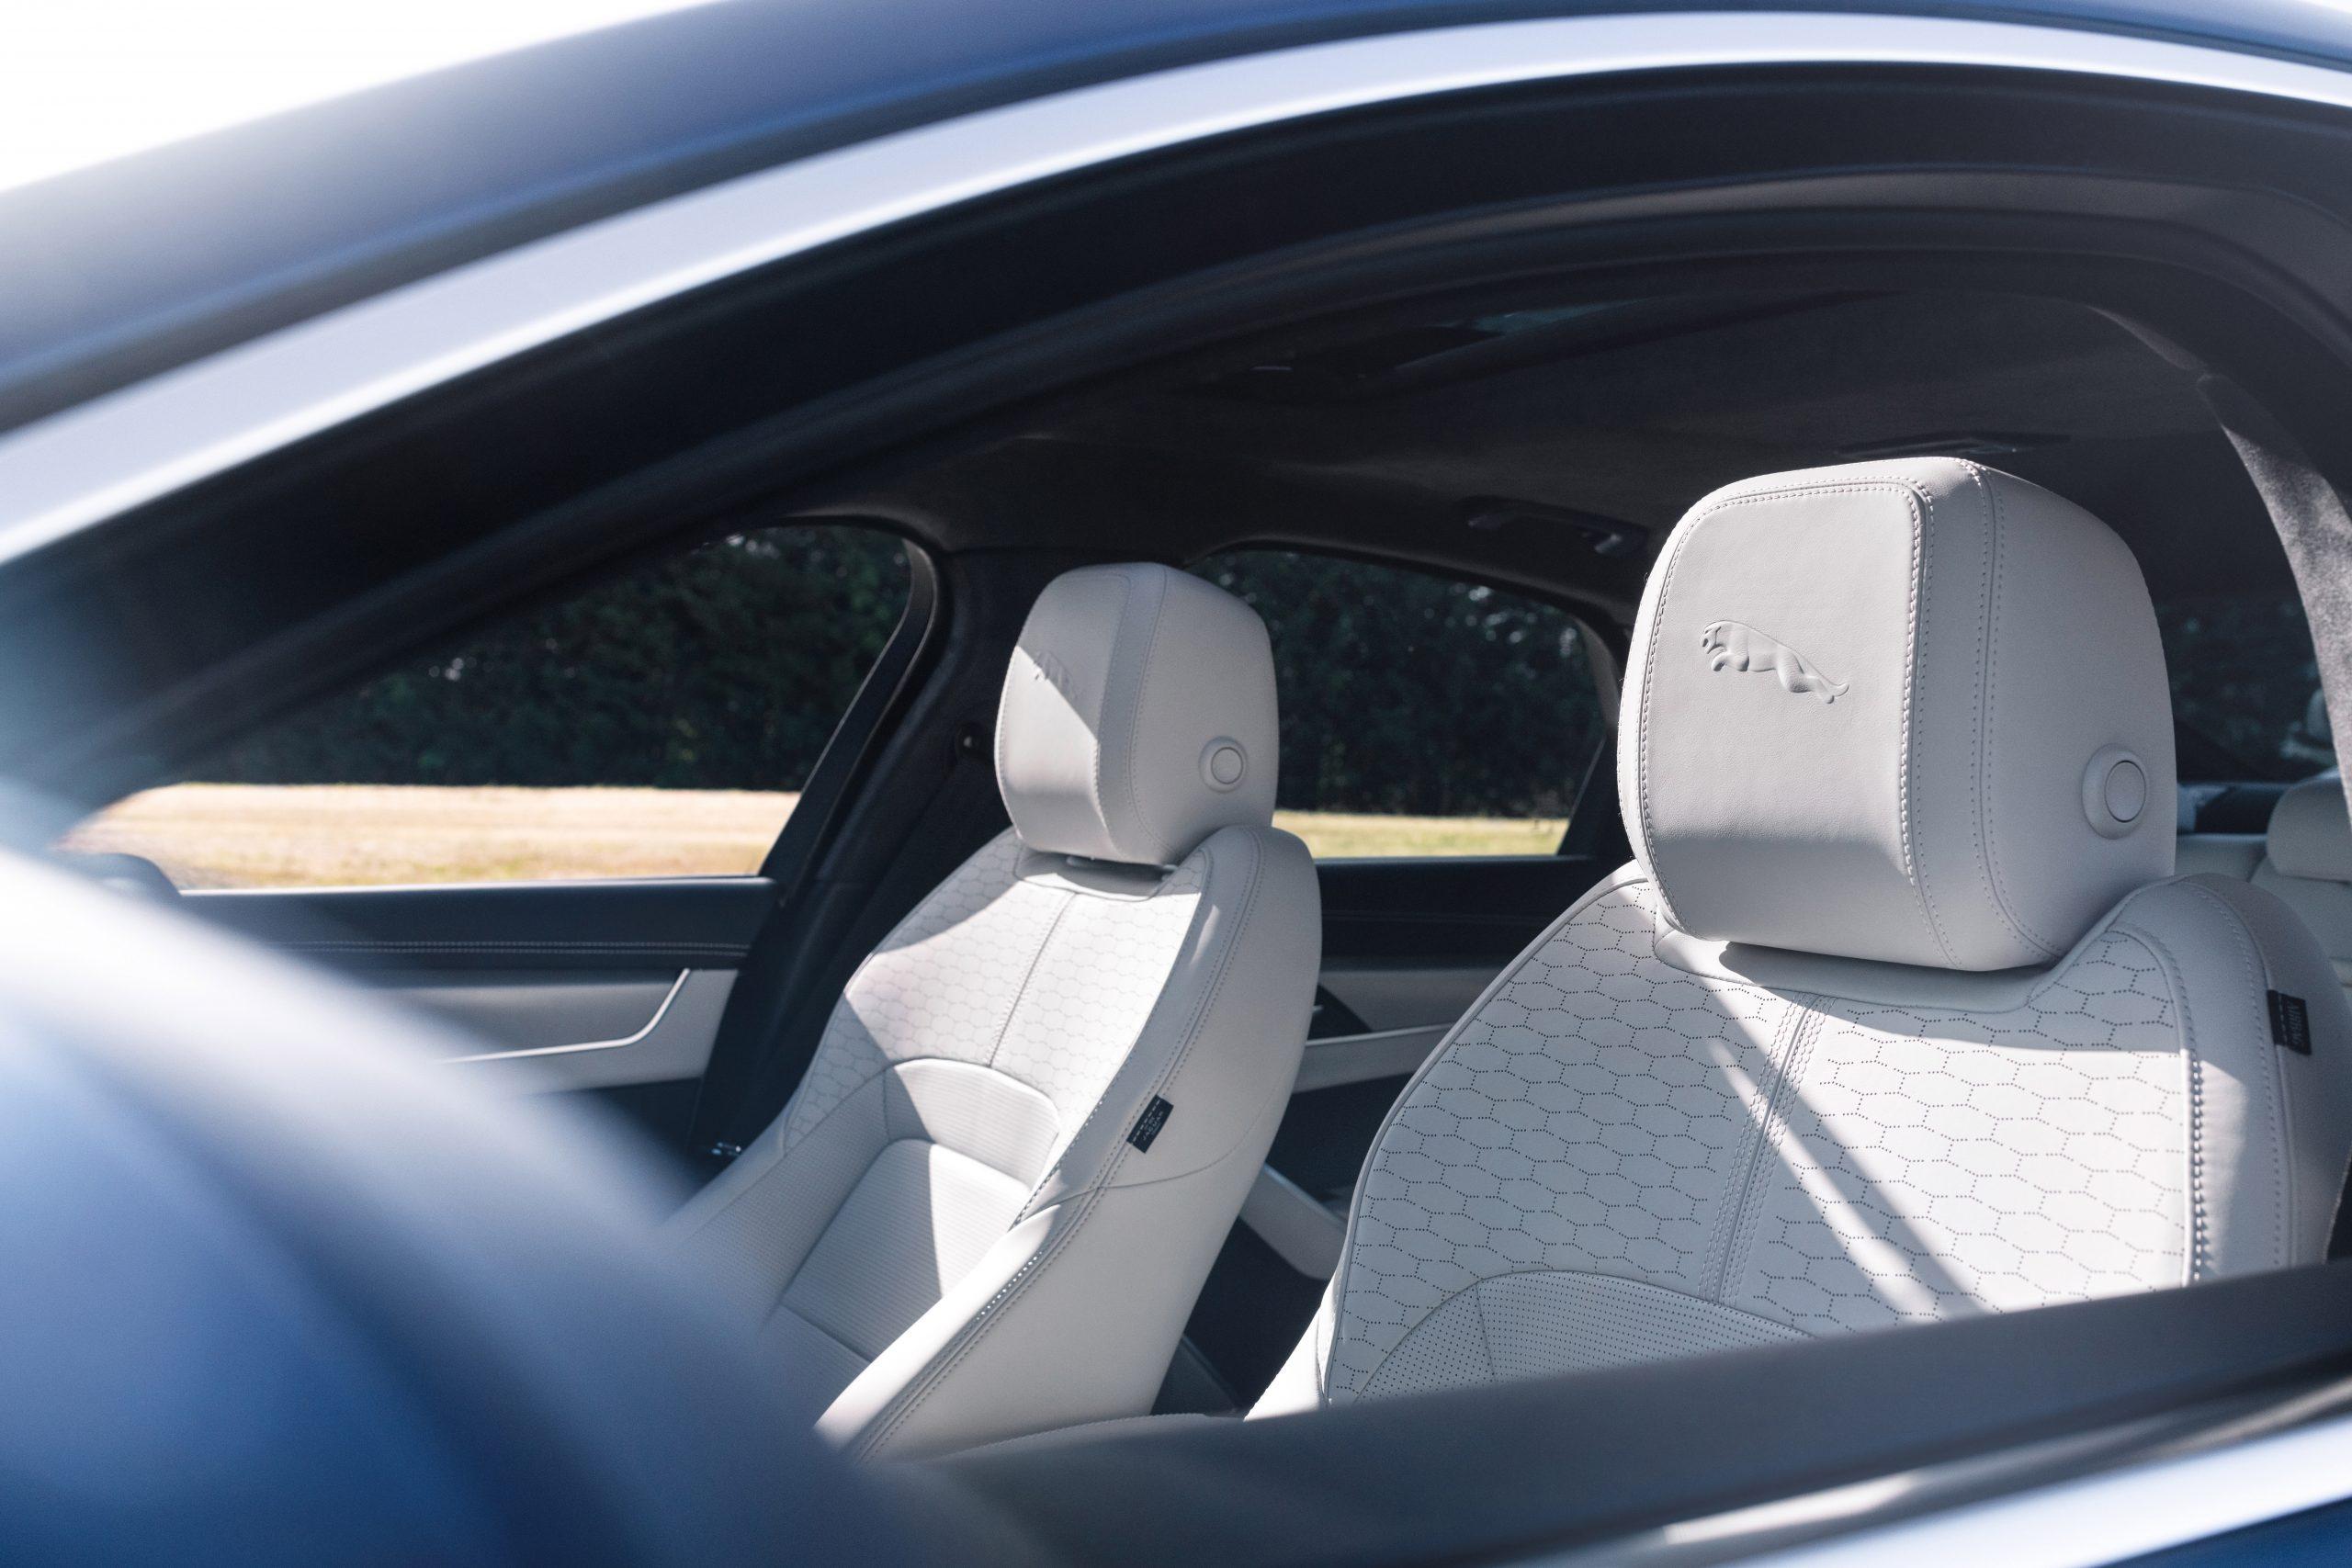 202021 Jaguar XF interior seat embossed headrest